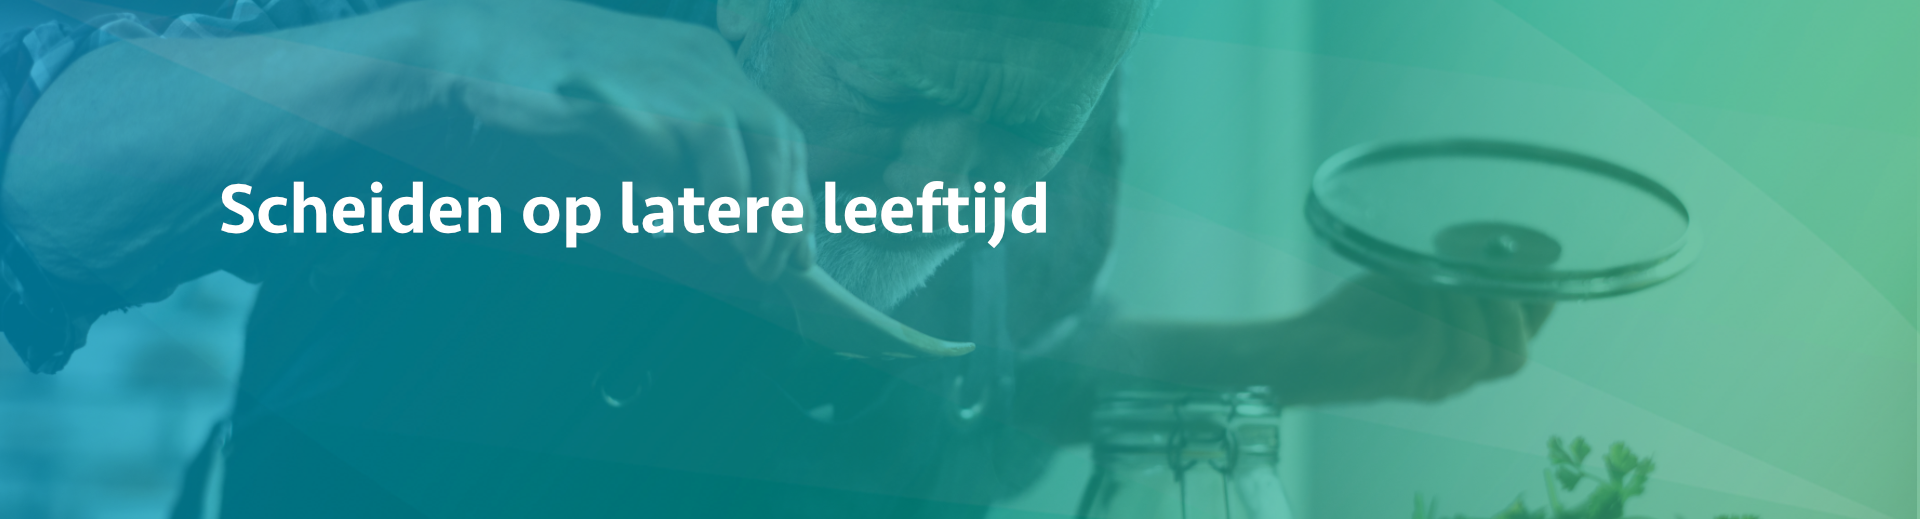 scheiden op latere leeftijd - Scheidingsplanner Almelo - Deventer - Nijverdal